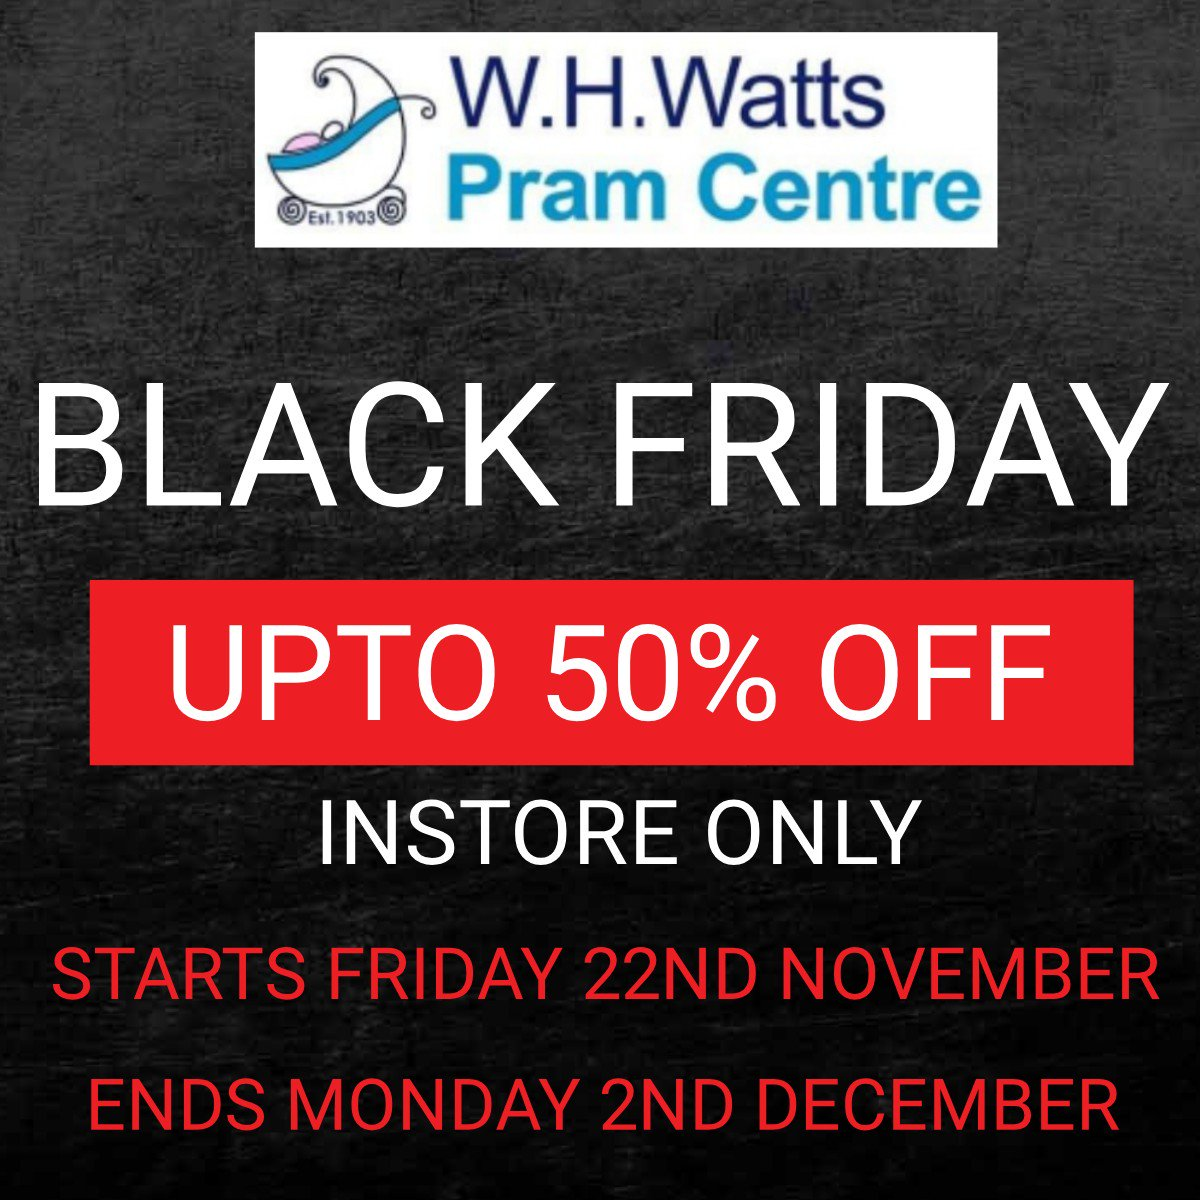 W H Watts Pram Centre On Twitter